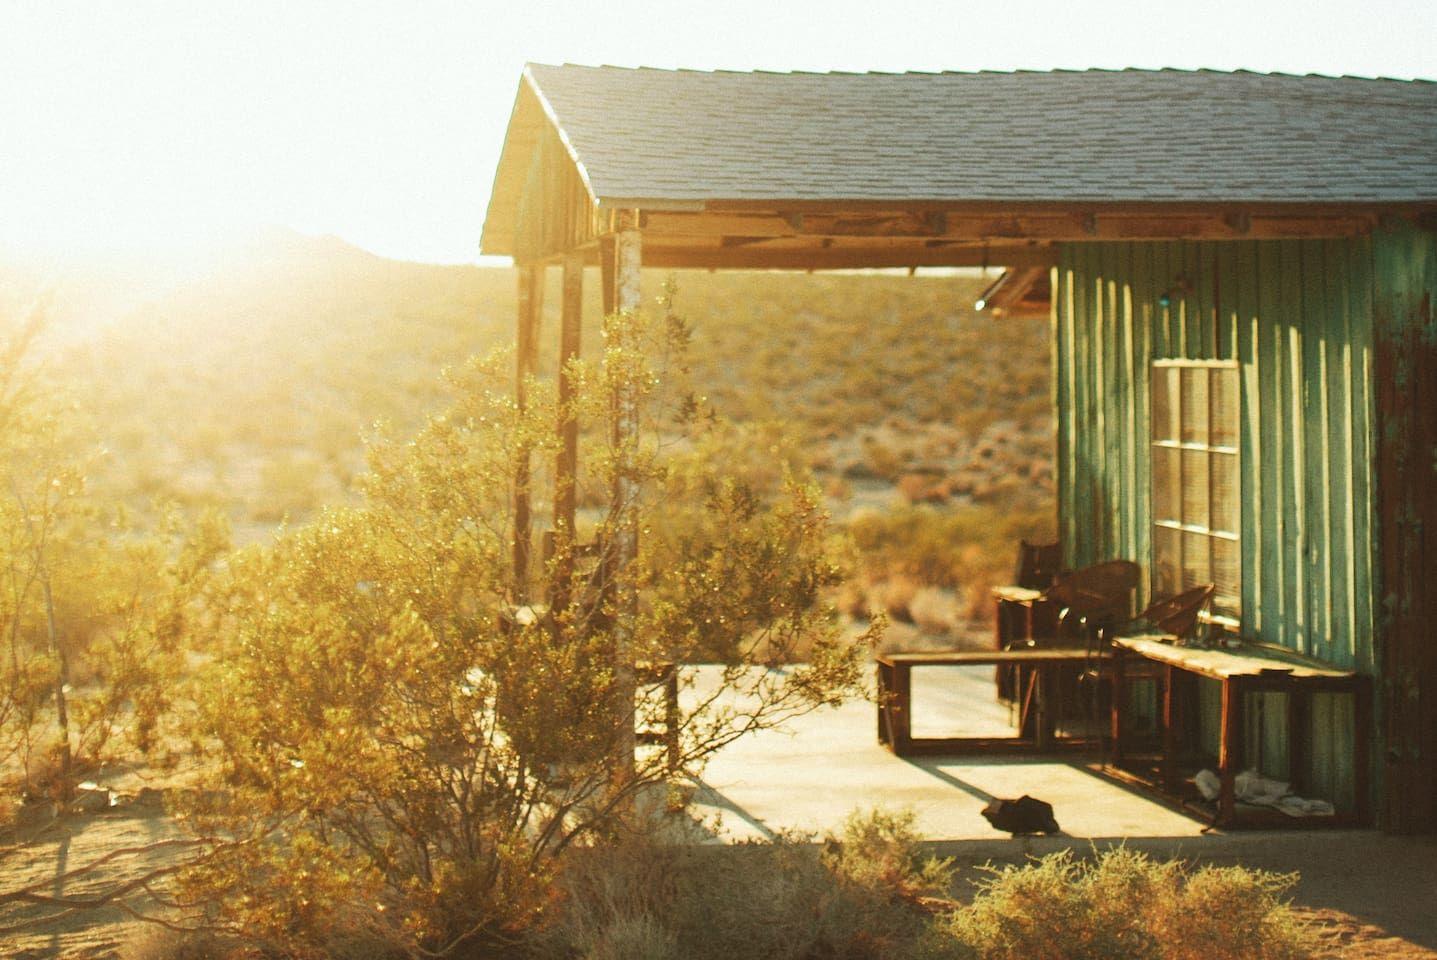 Joshua tree homesteader cabin cottages for rent in